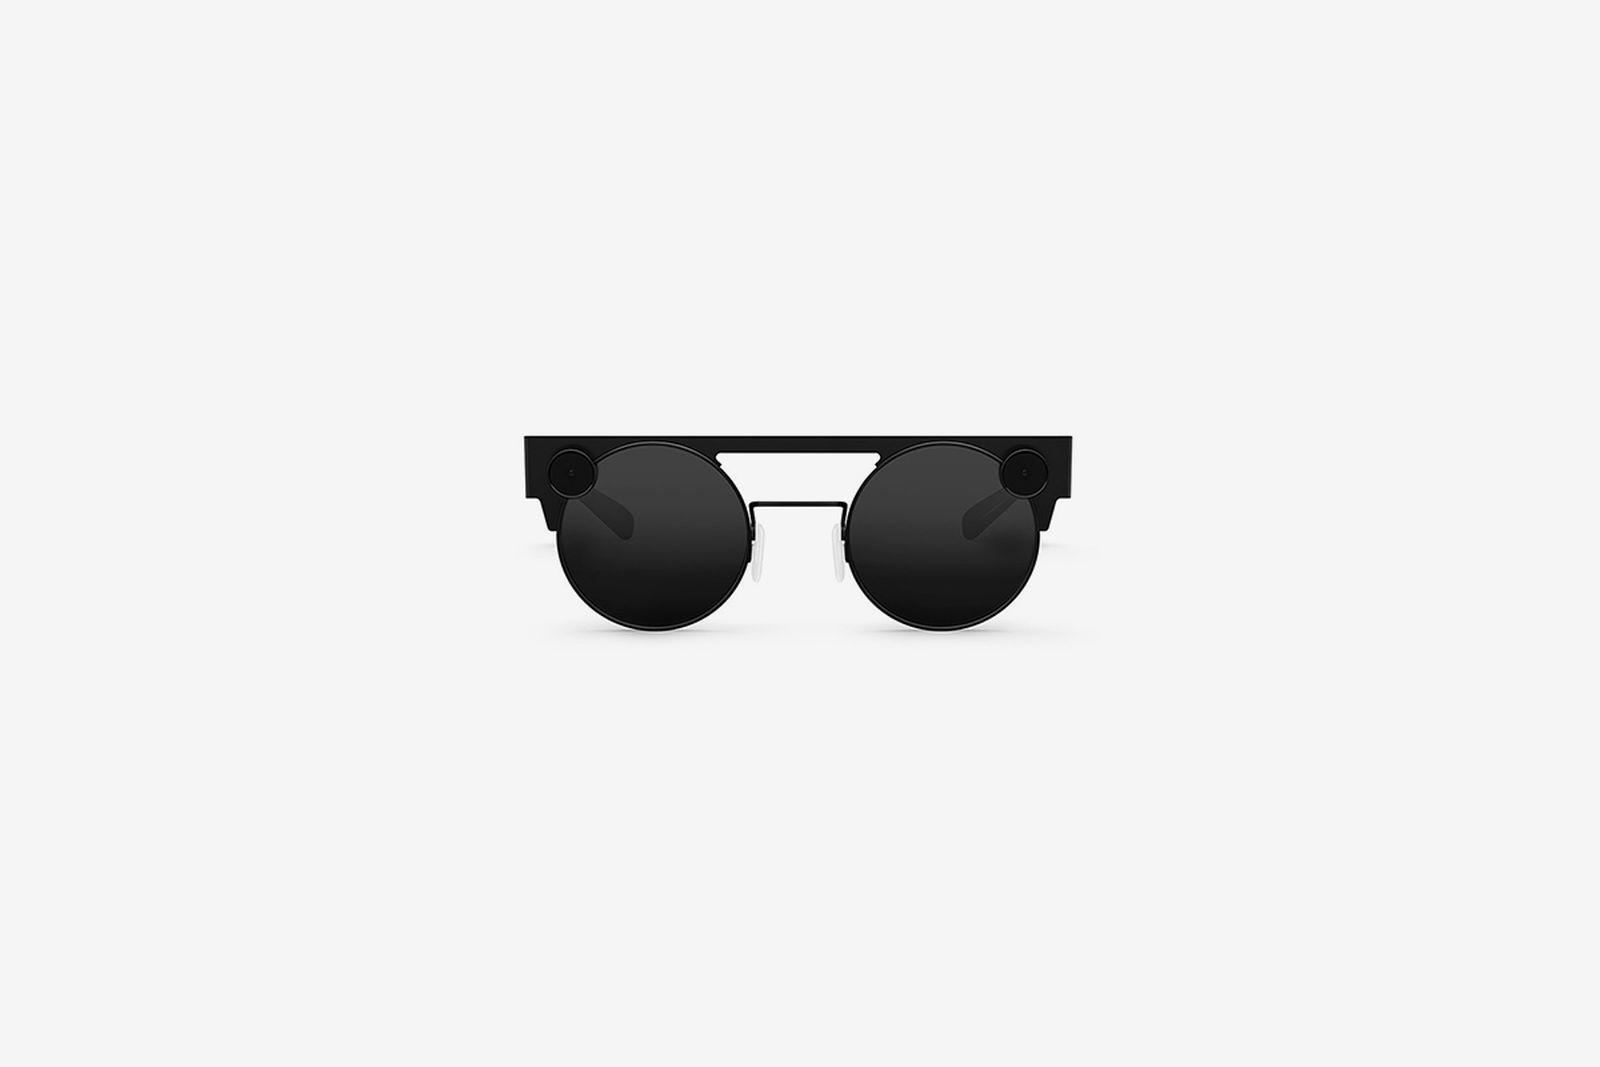 snap spectacles 3 1 Snap Inc. snapchat